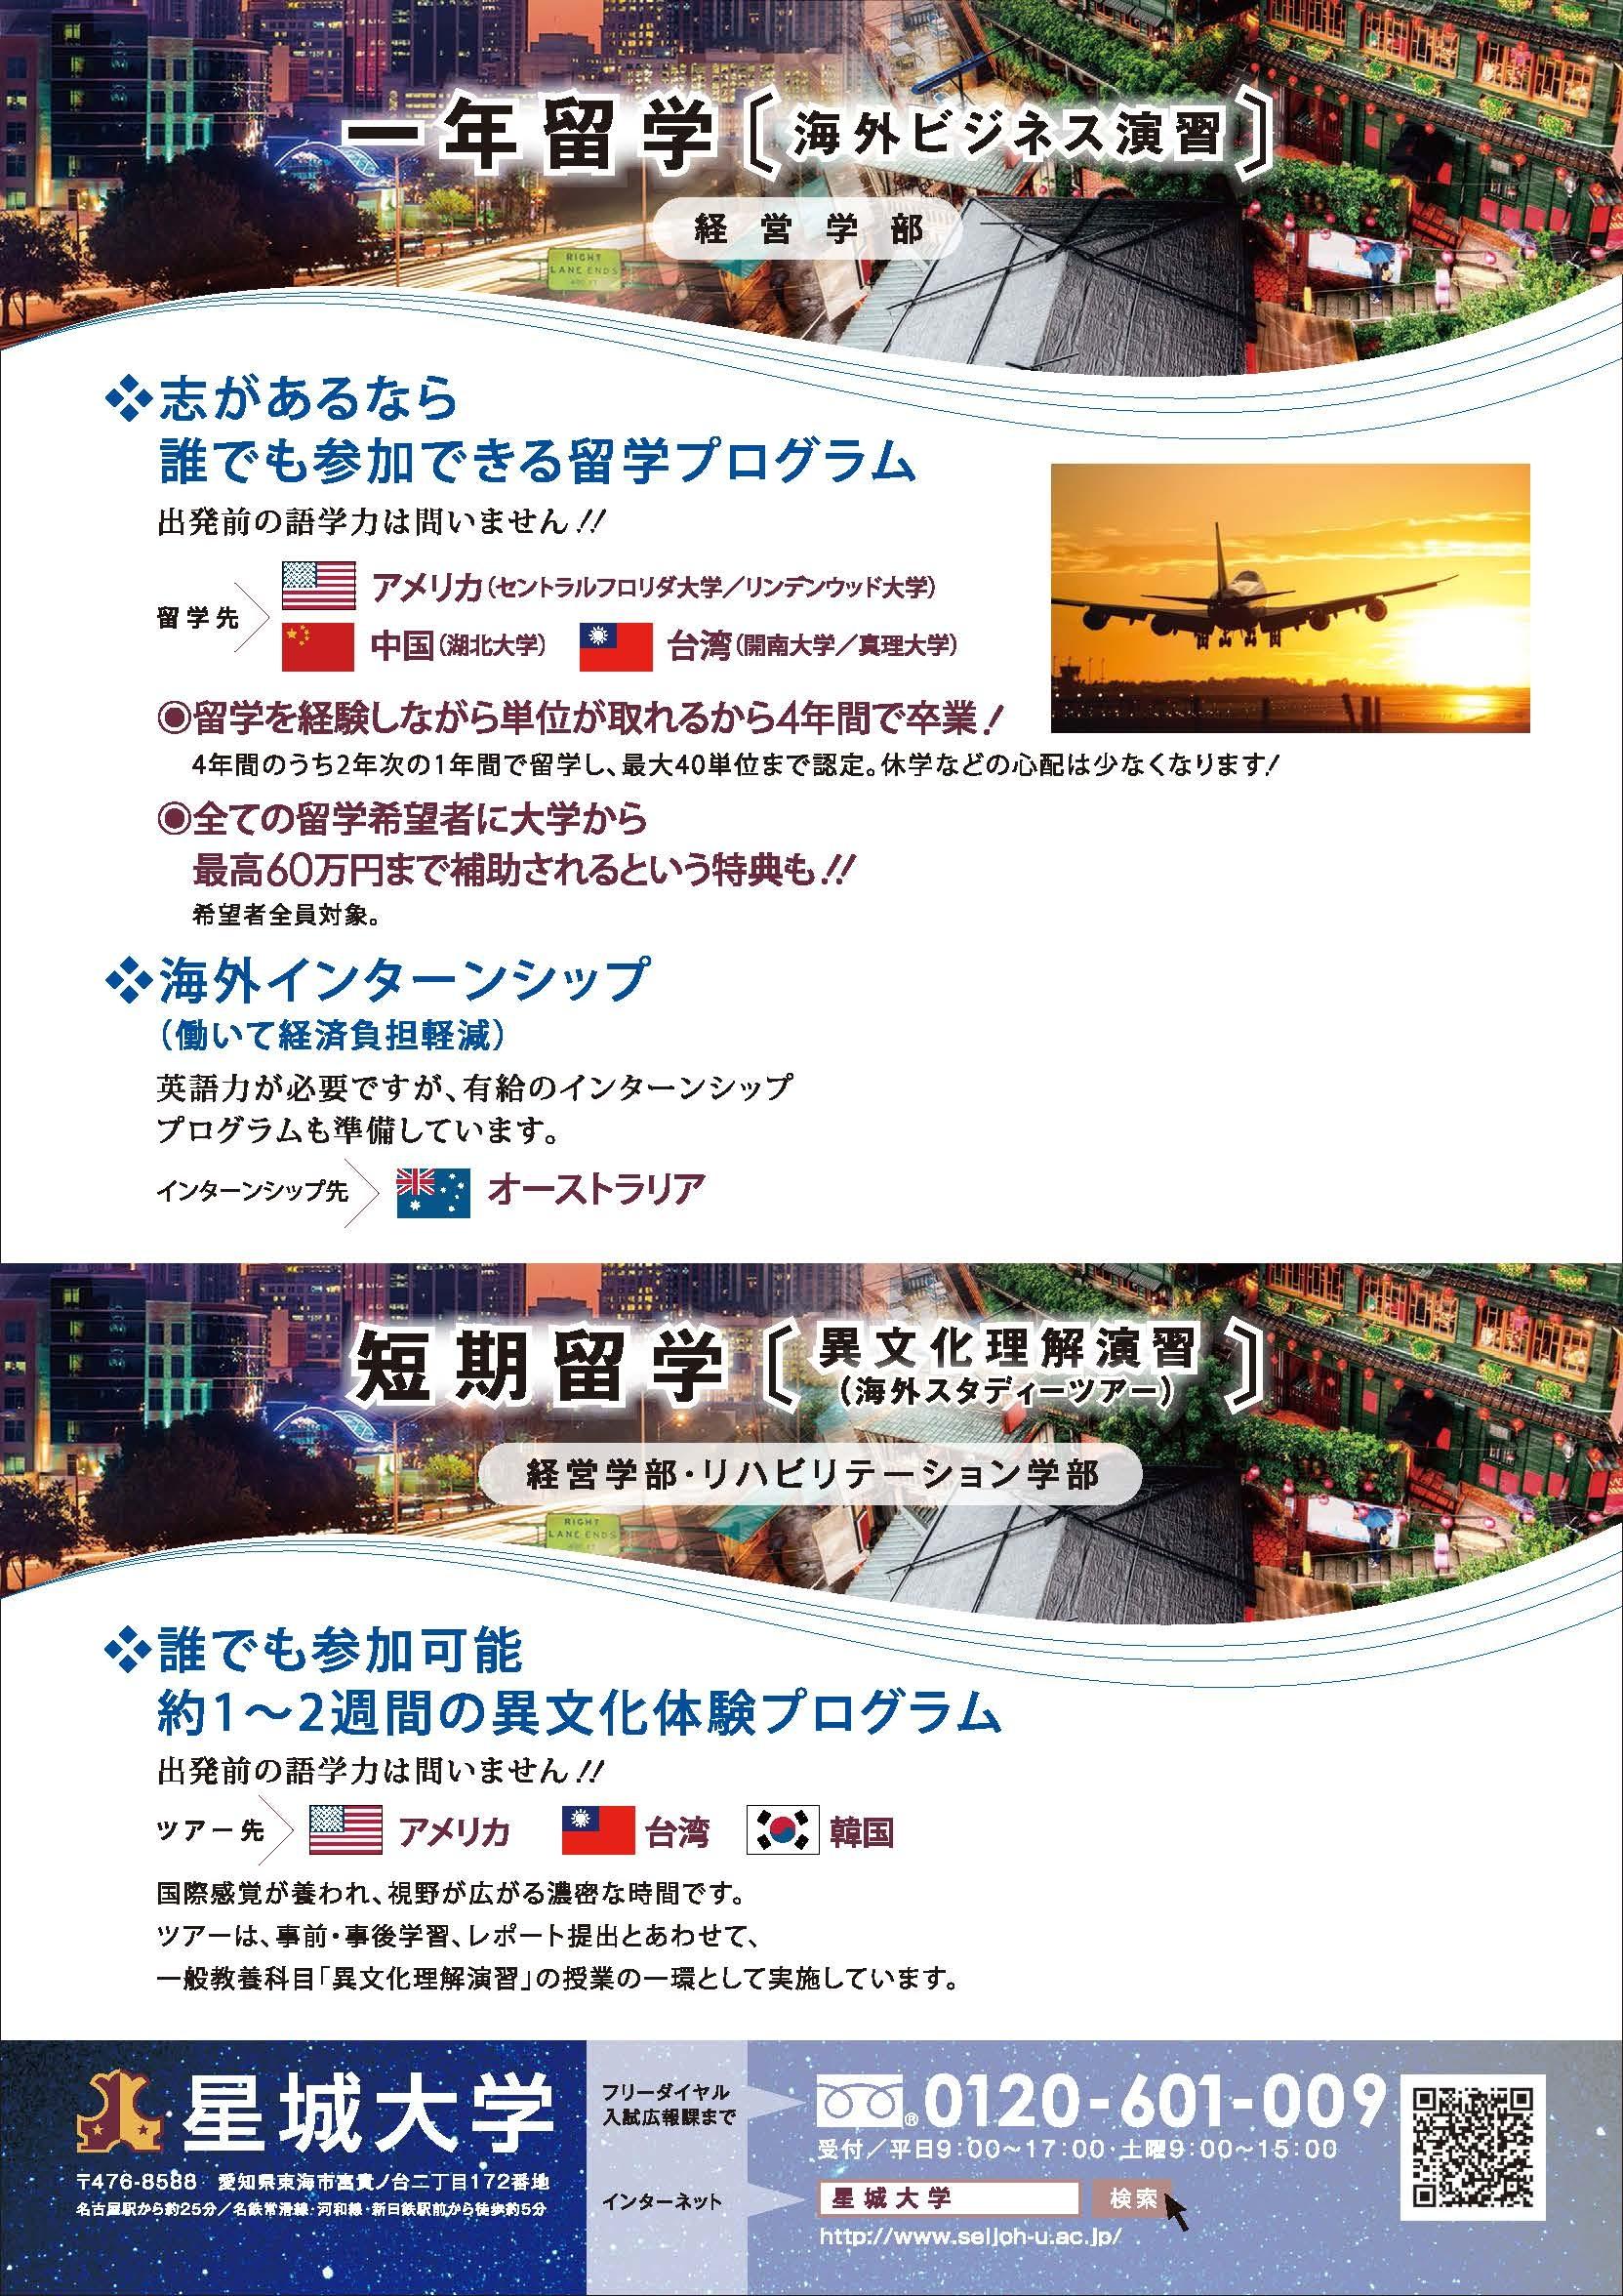 http://seijoh.acplanet.biz/guide/mt_imgs/7kou_kaigairyugaku_ura_2018.jpg